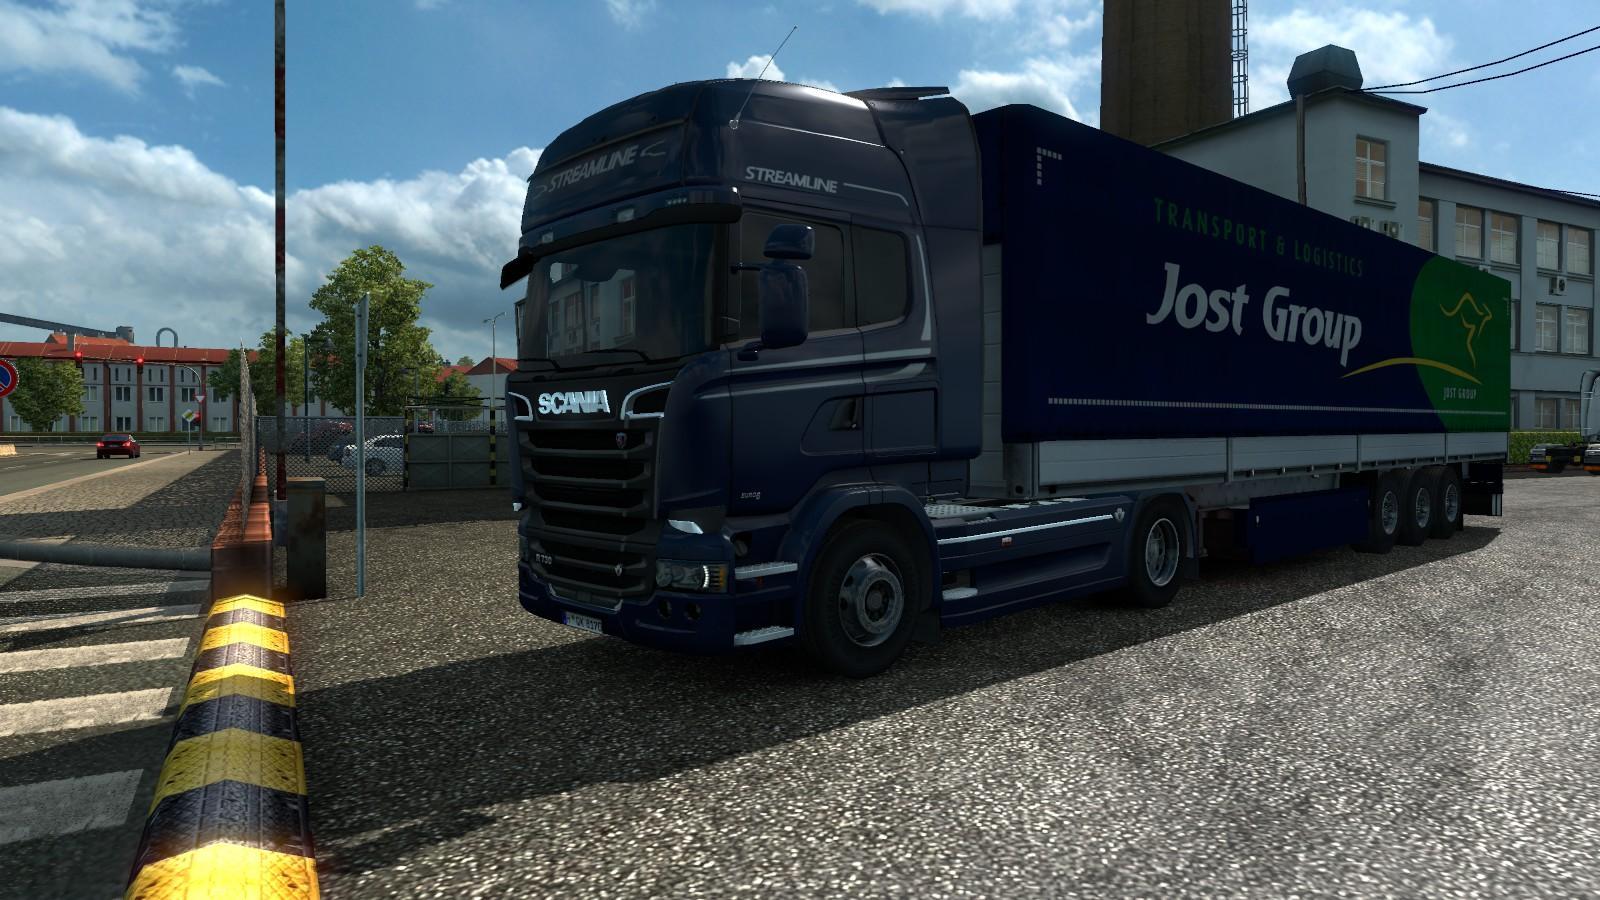 jost-group-trailer-47-cargo-1-21-x_1